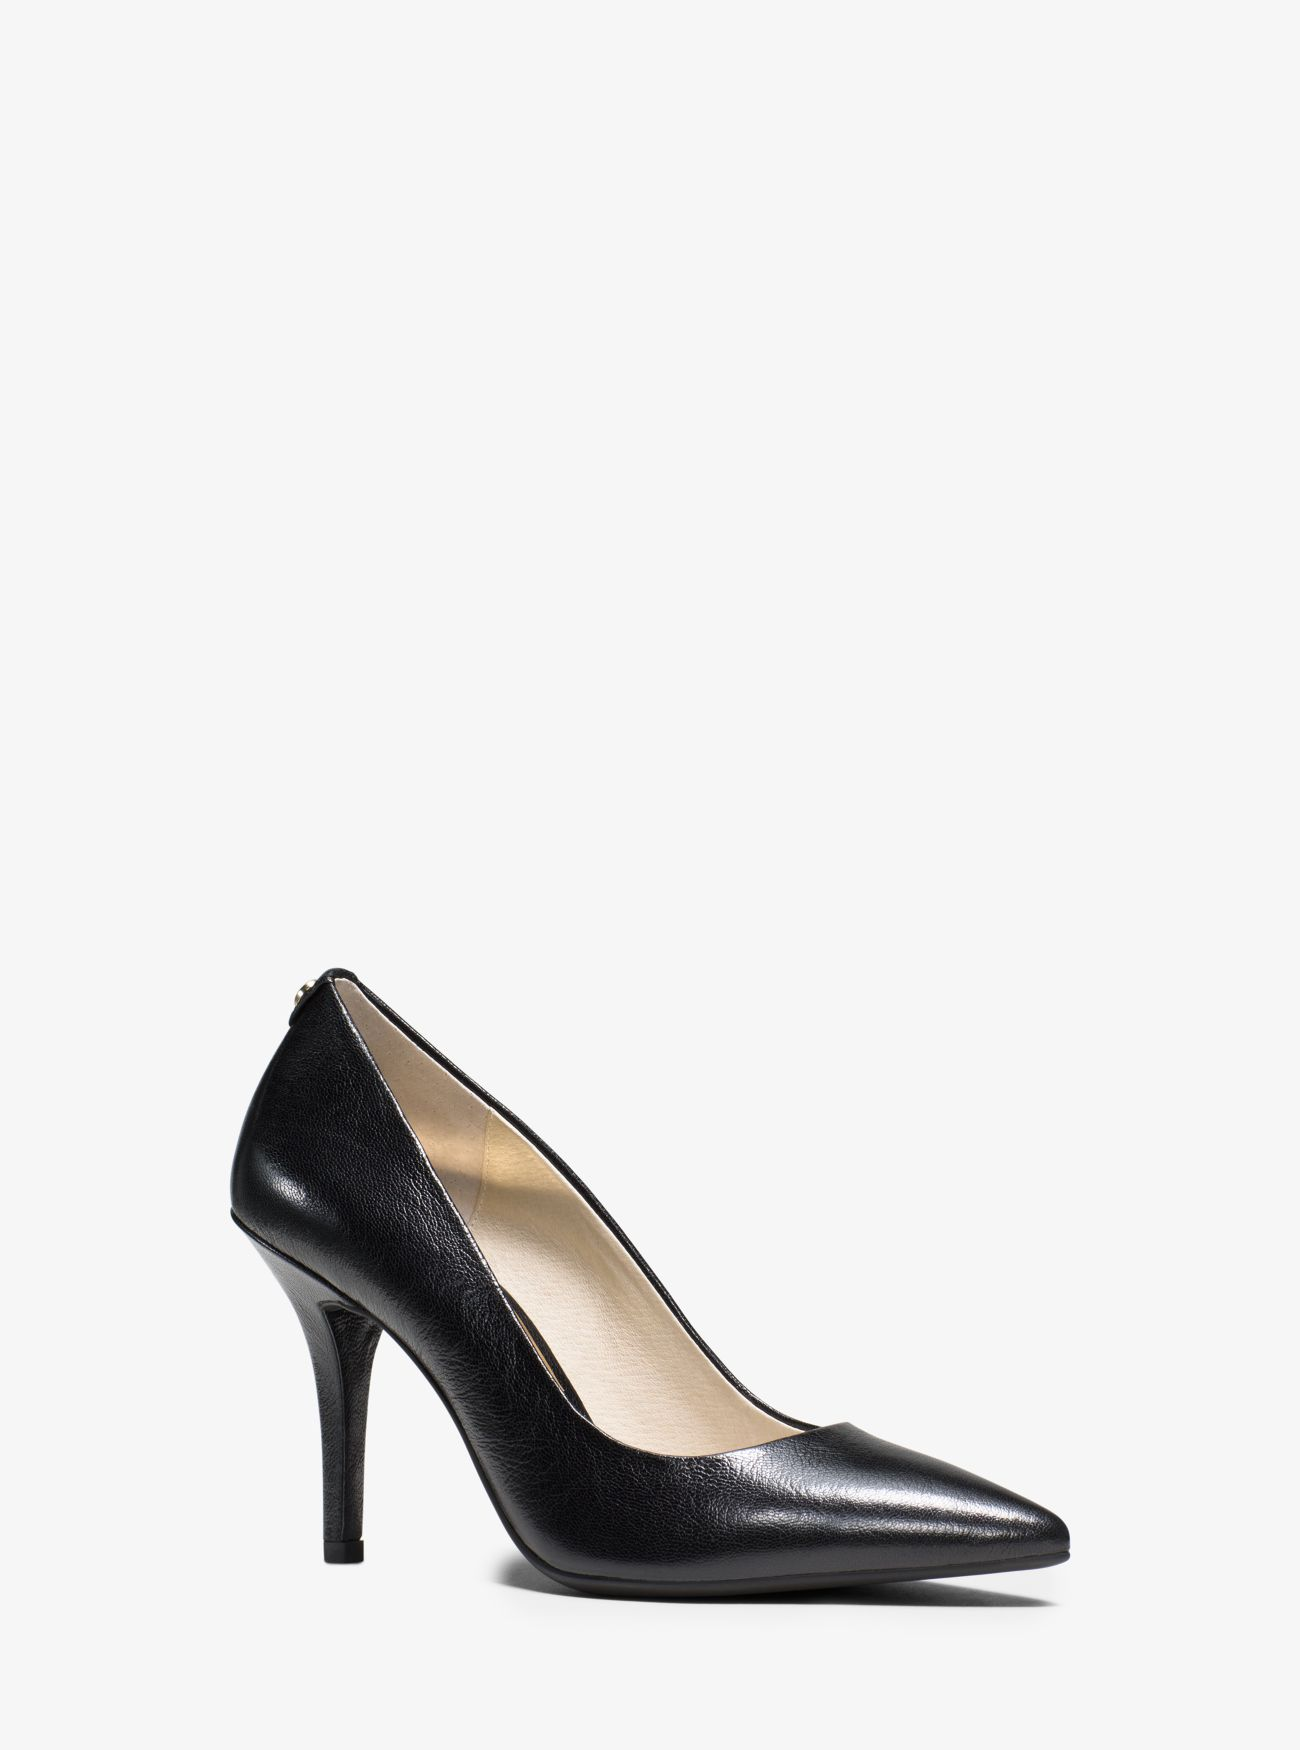 Jamaica High Heel Shoes